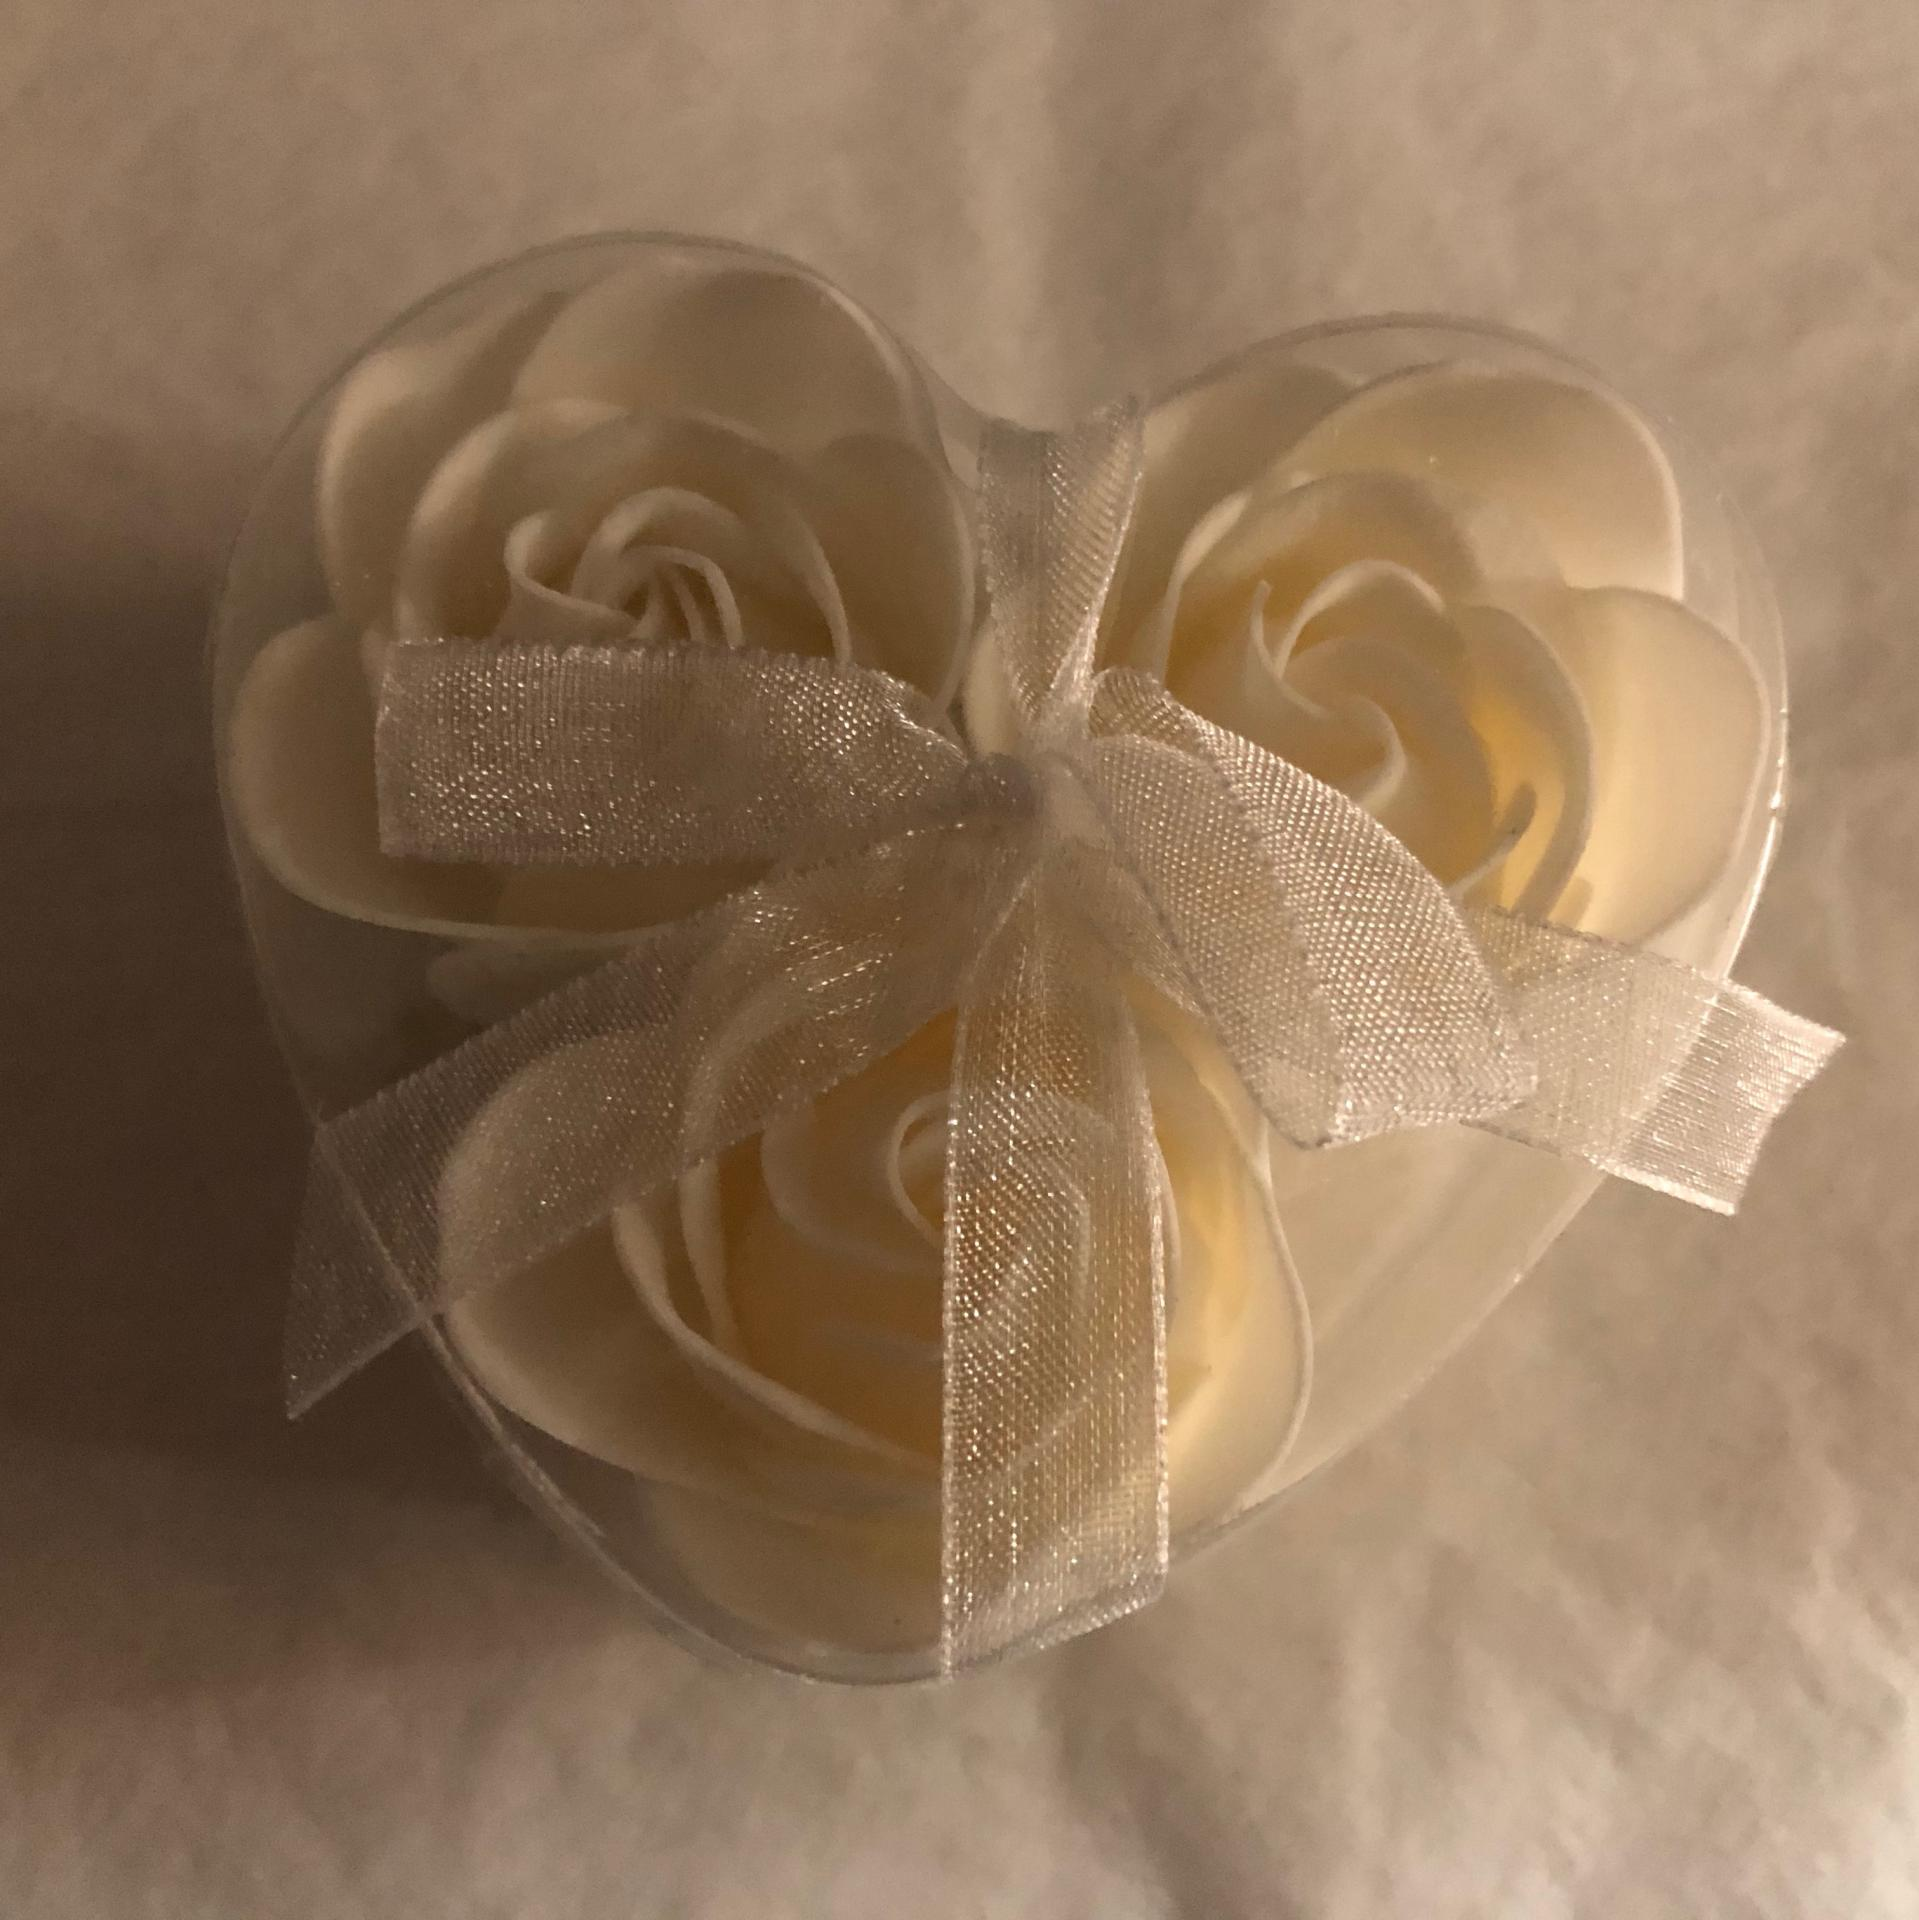 Boutons de rose x3 blanc